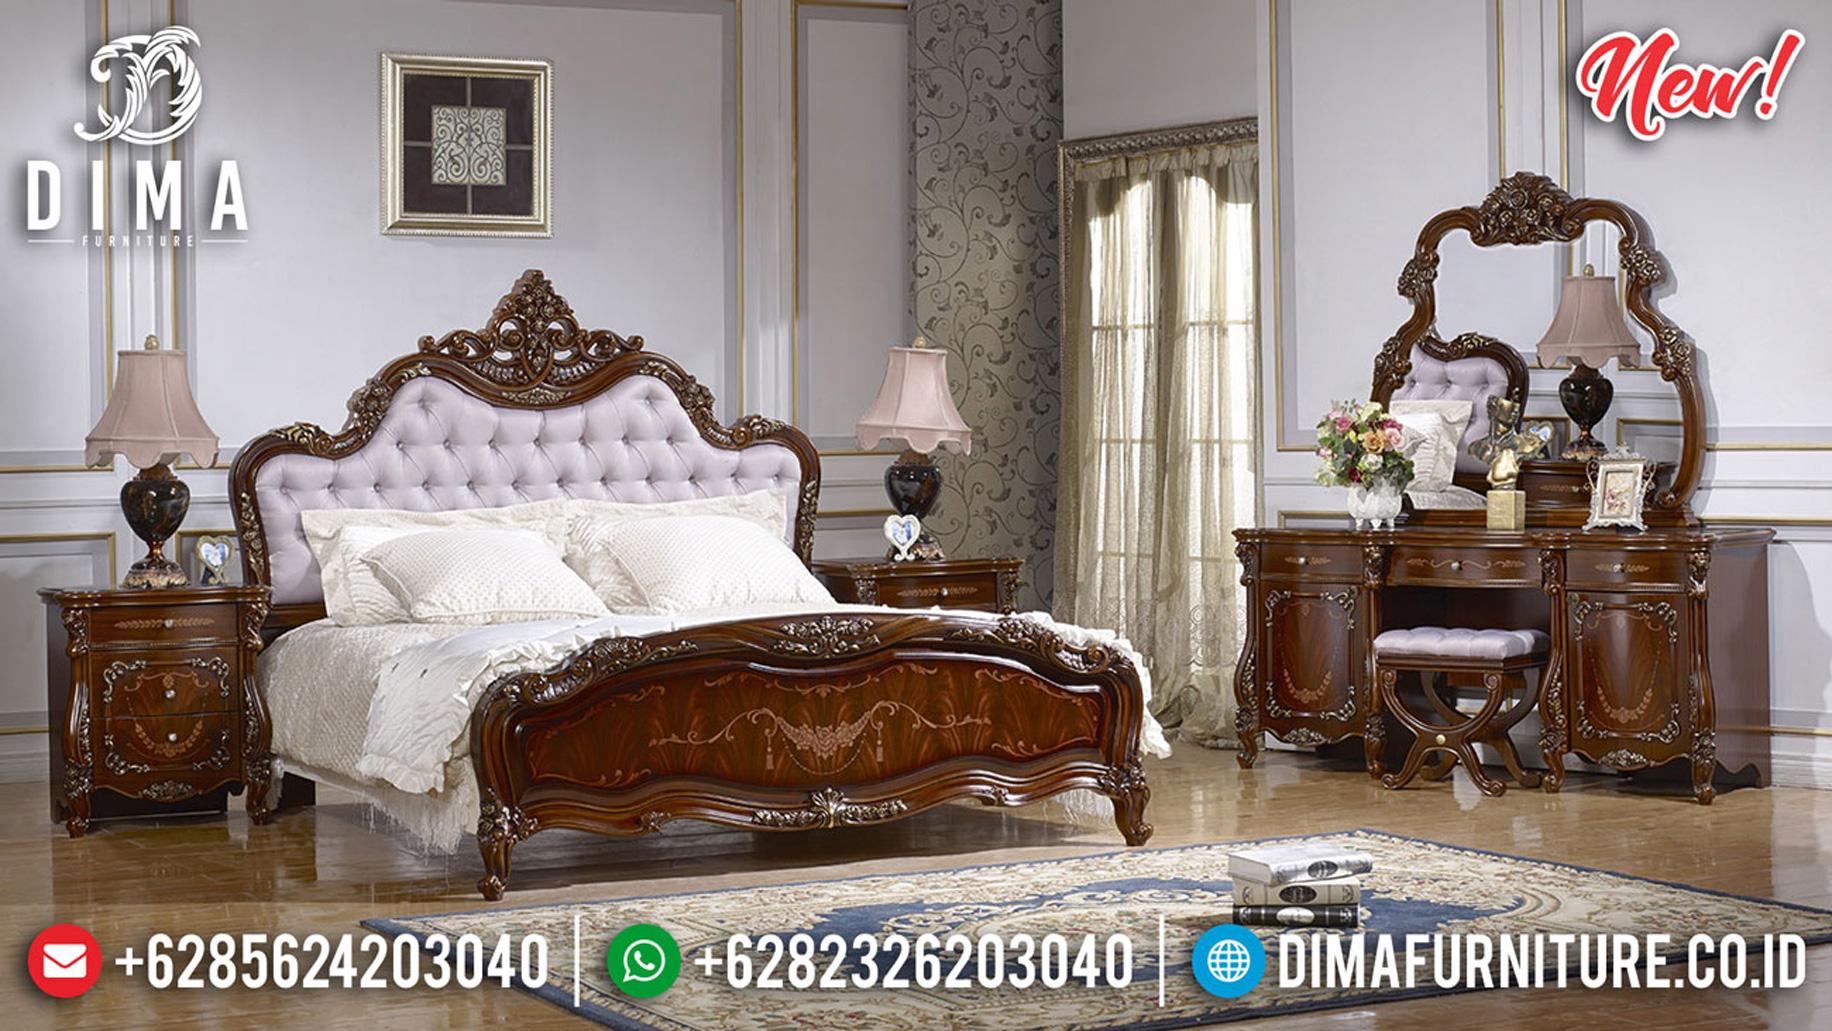 Best Item Kamar Set Mewah Natural Jati Luxury With Marquetry Roses Motif ST-1174